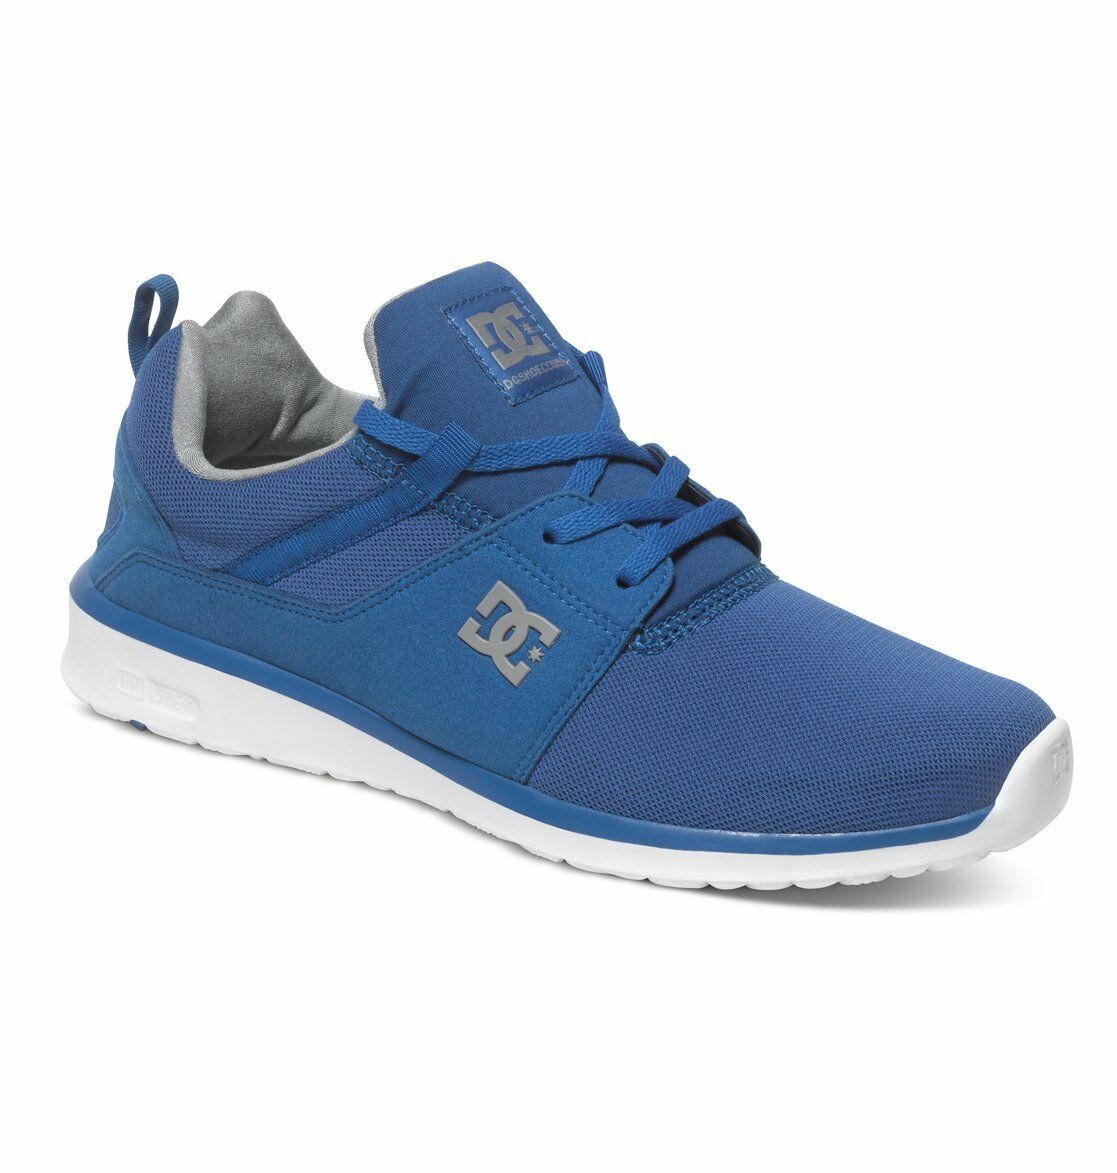 Neu DC Shoes Heathrow Unisex Sneakers Turnschuhe Laufschuhe blue grey